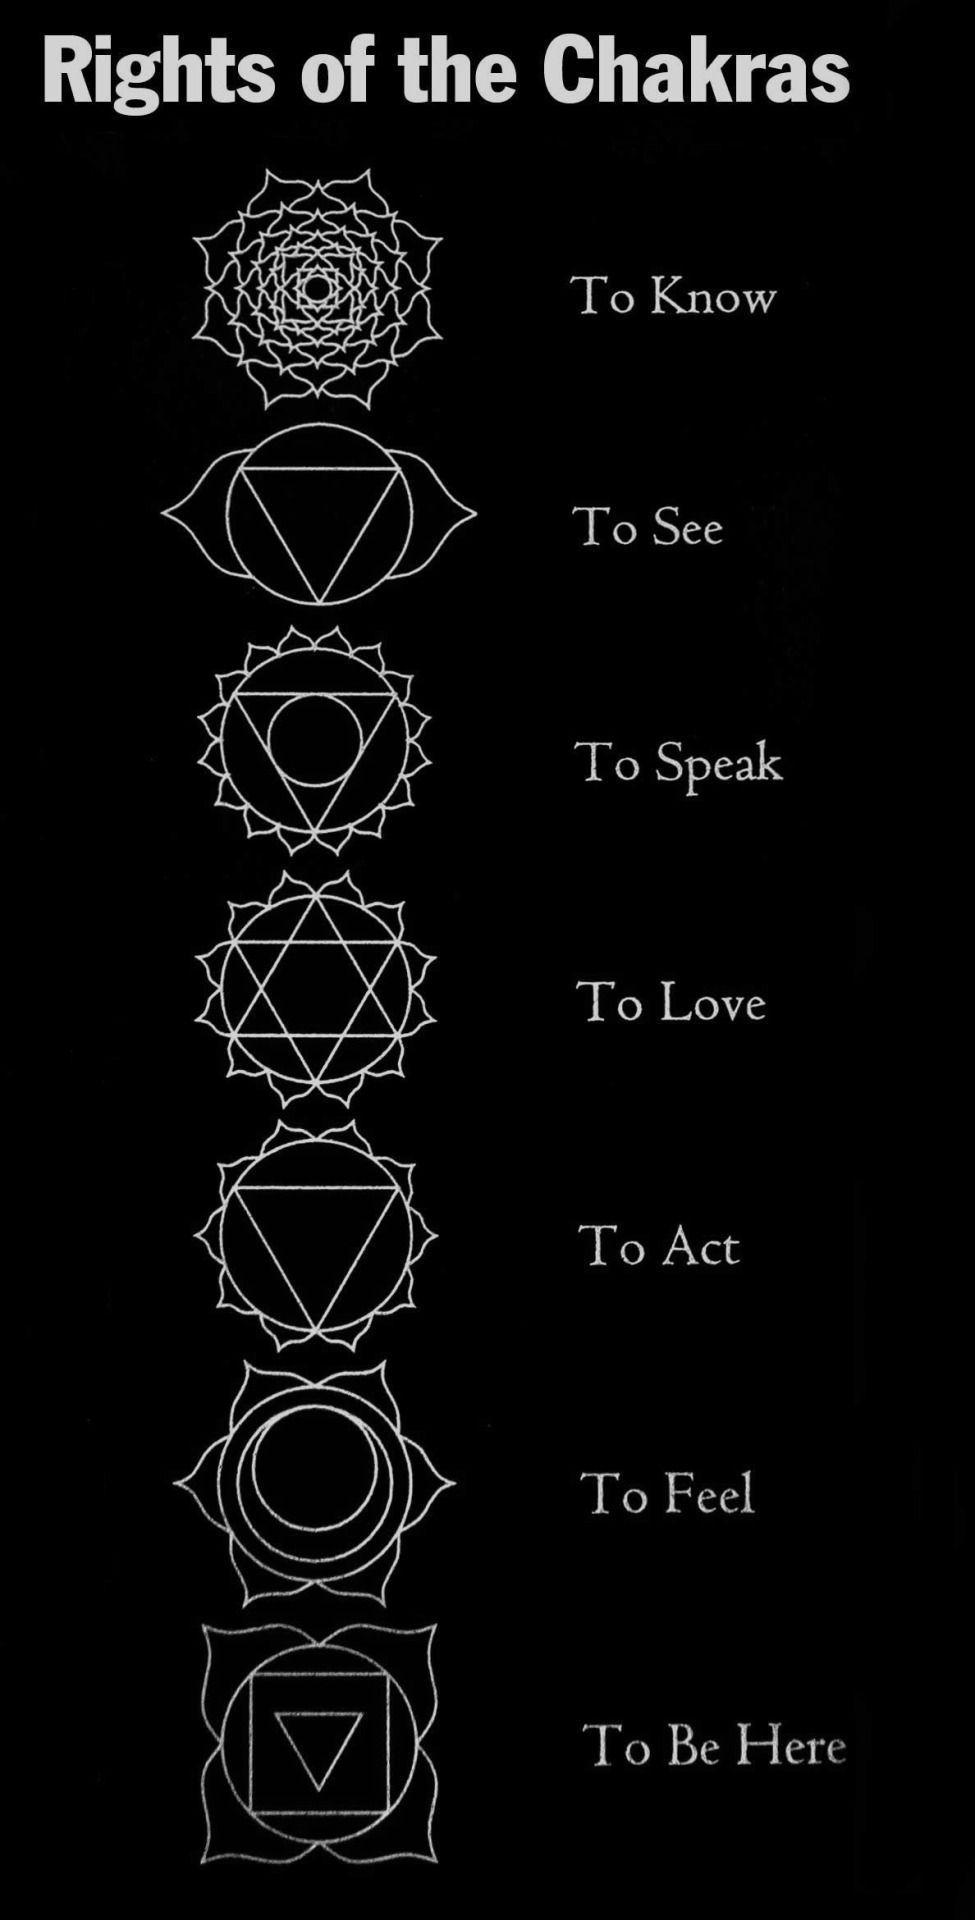 J Ai L Impression Que : impression, Rights, Chakras., Chakra, Seven, Right, Accurate, Information,, Knowledge,, Truth…, Geometric, Tattoo,, Spiritual, Tattoos